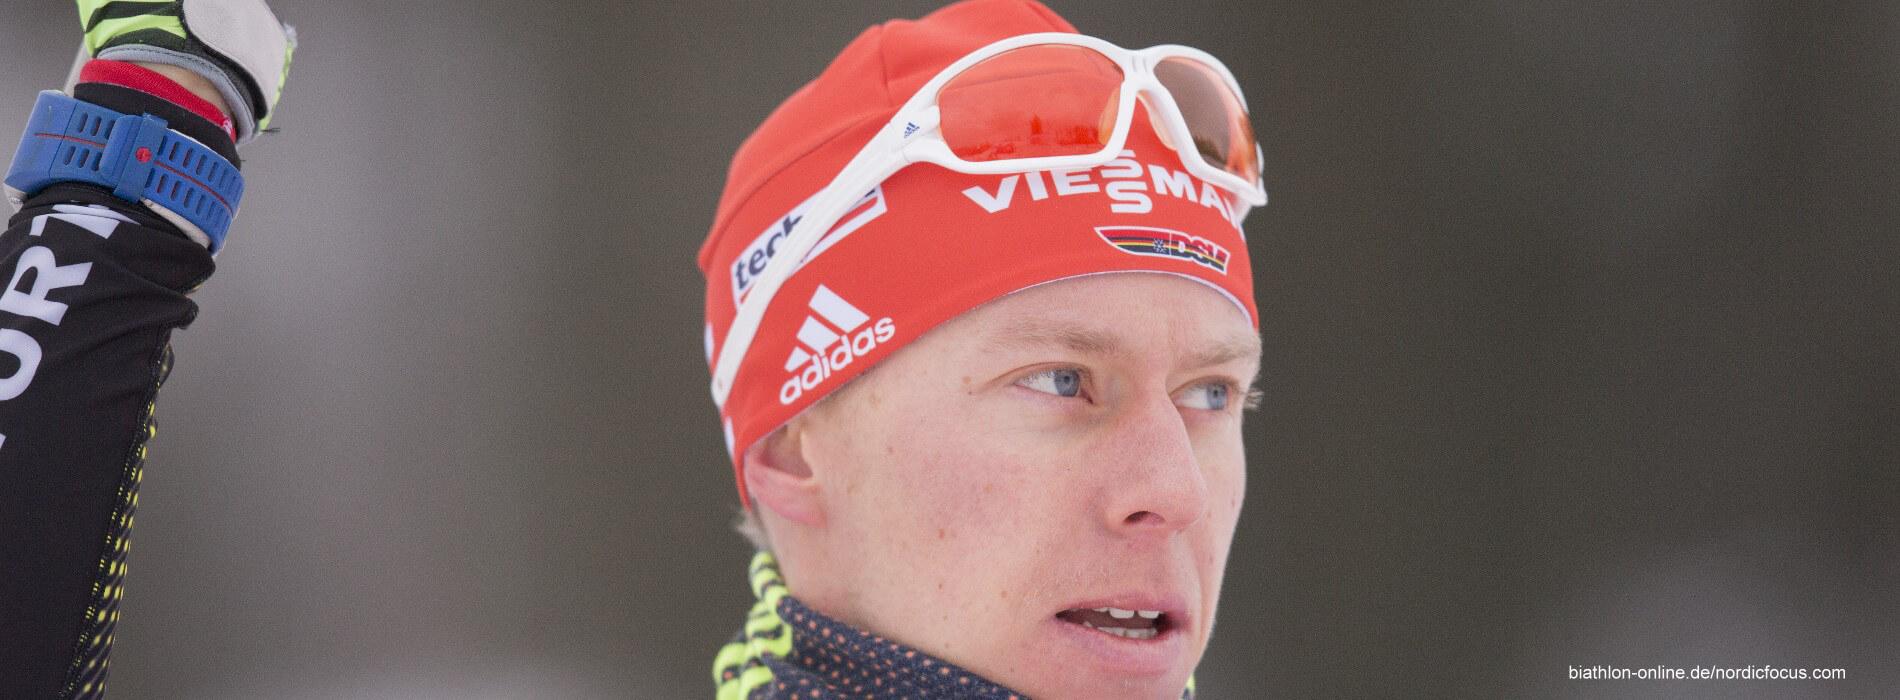 Daniel Böhm